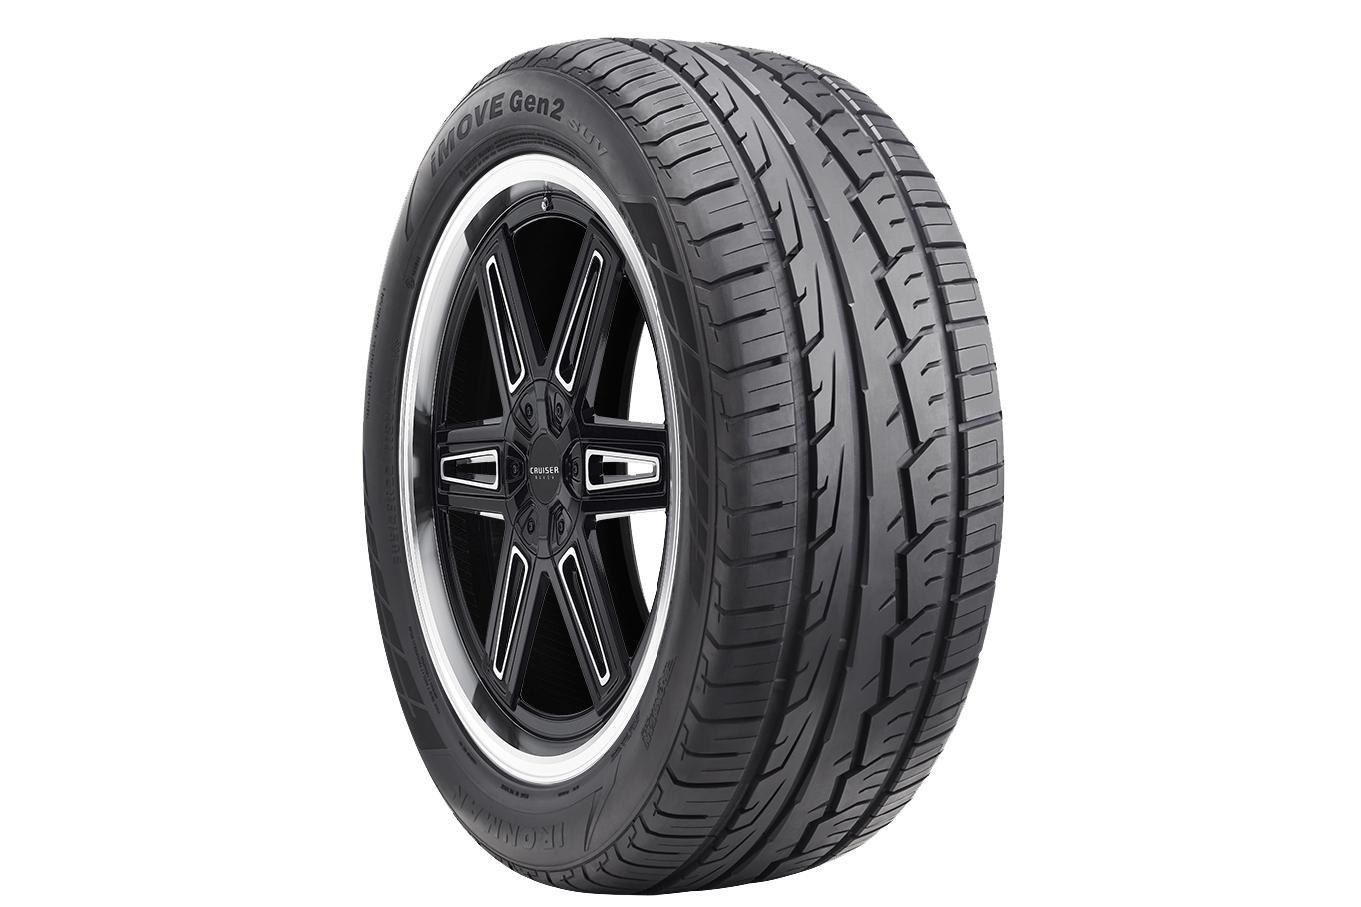 Hercules Tire представила новые SUV-шины Ironman iMOVE Gen2